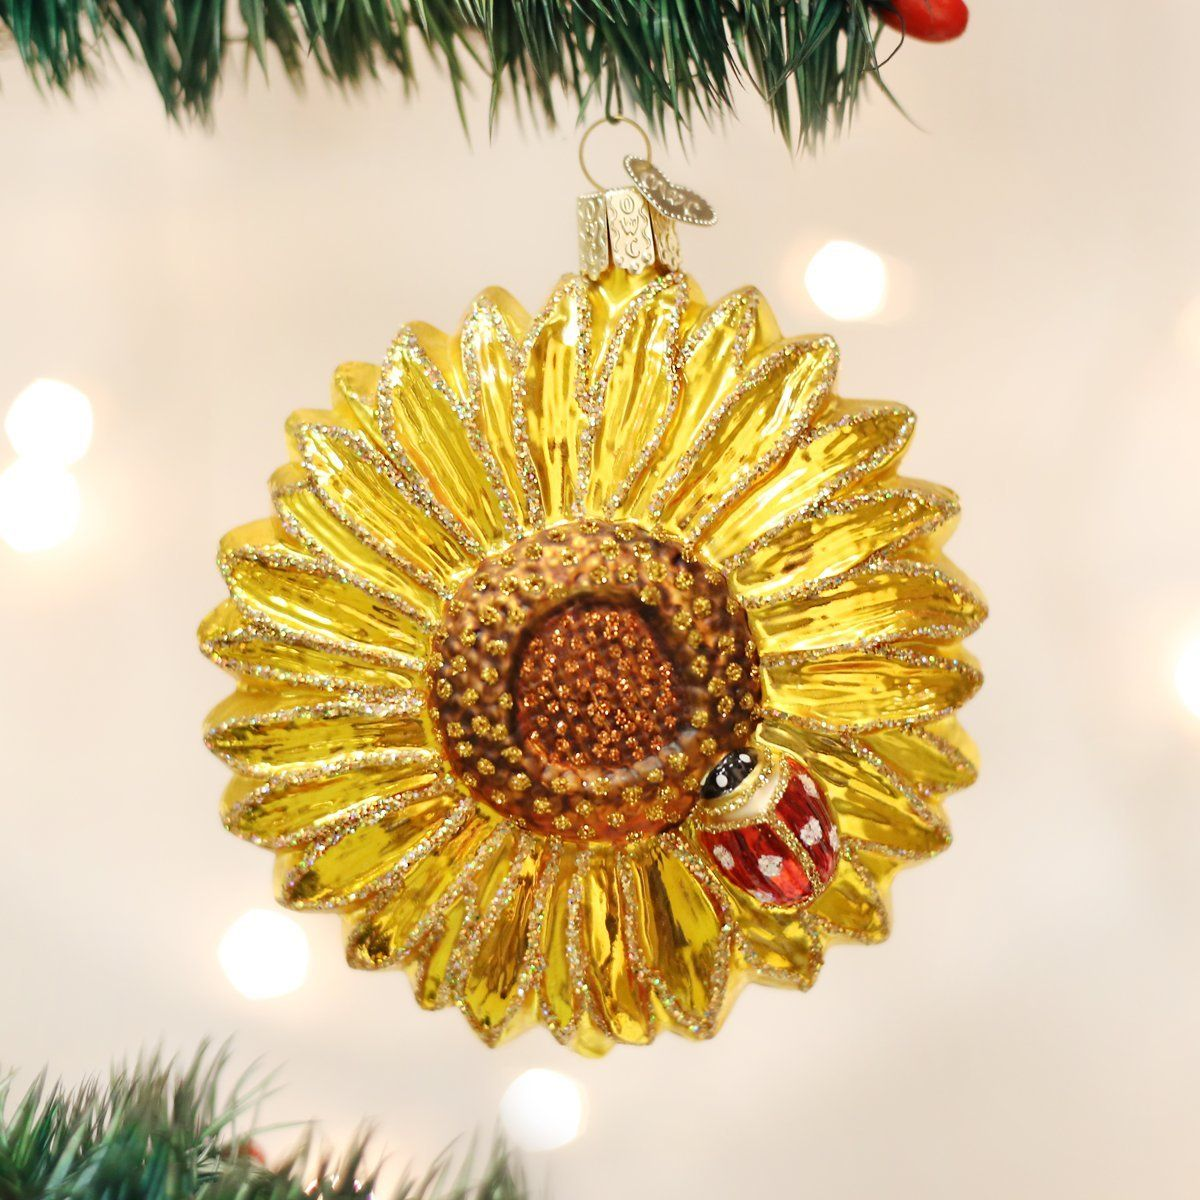 Old World Christmas Sunflower Glass Blown Ornament ** A